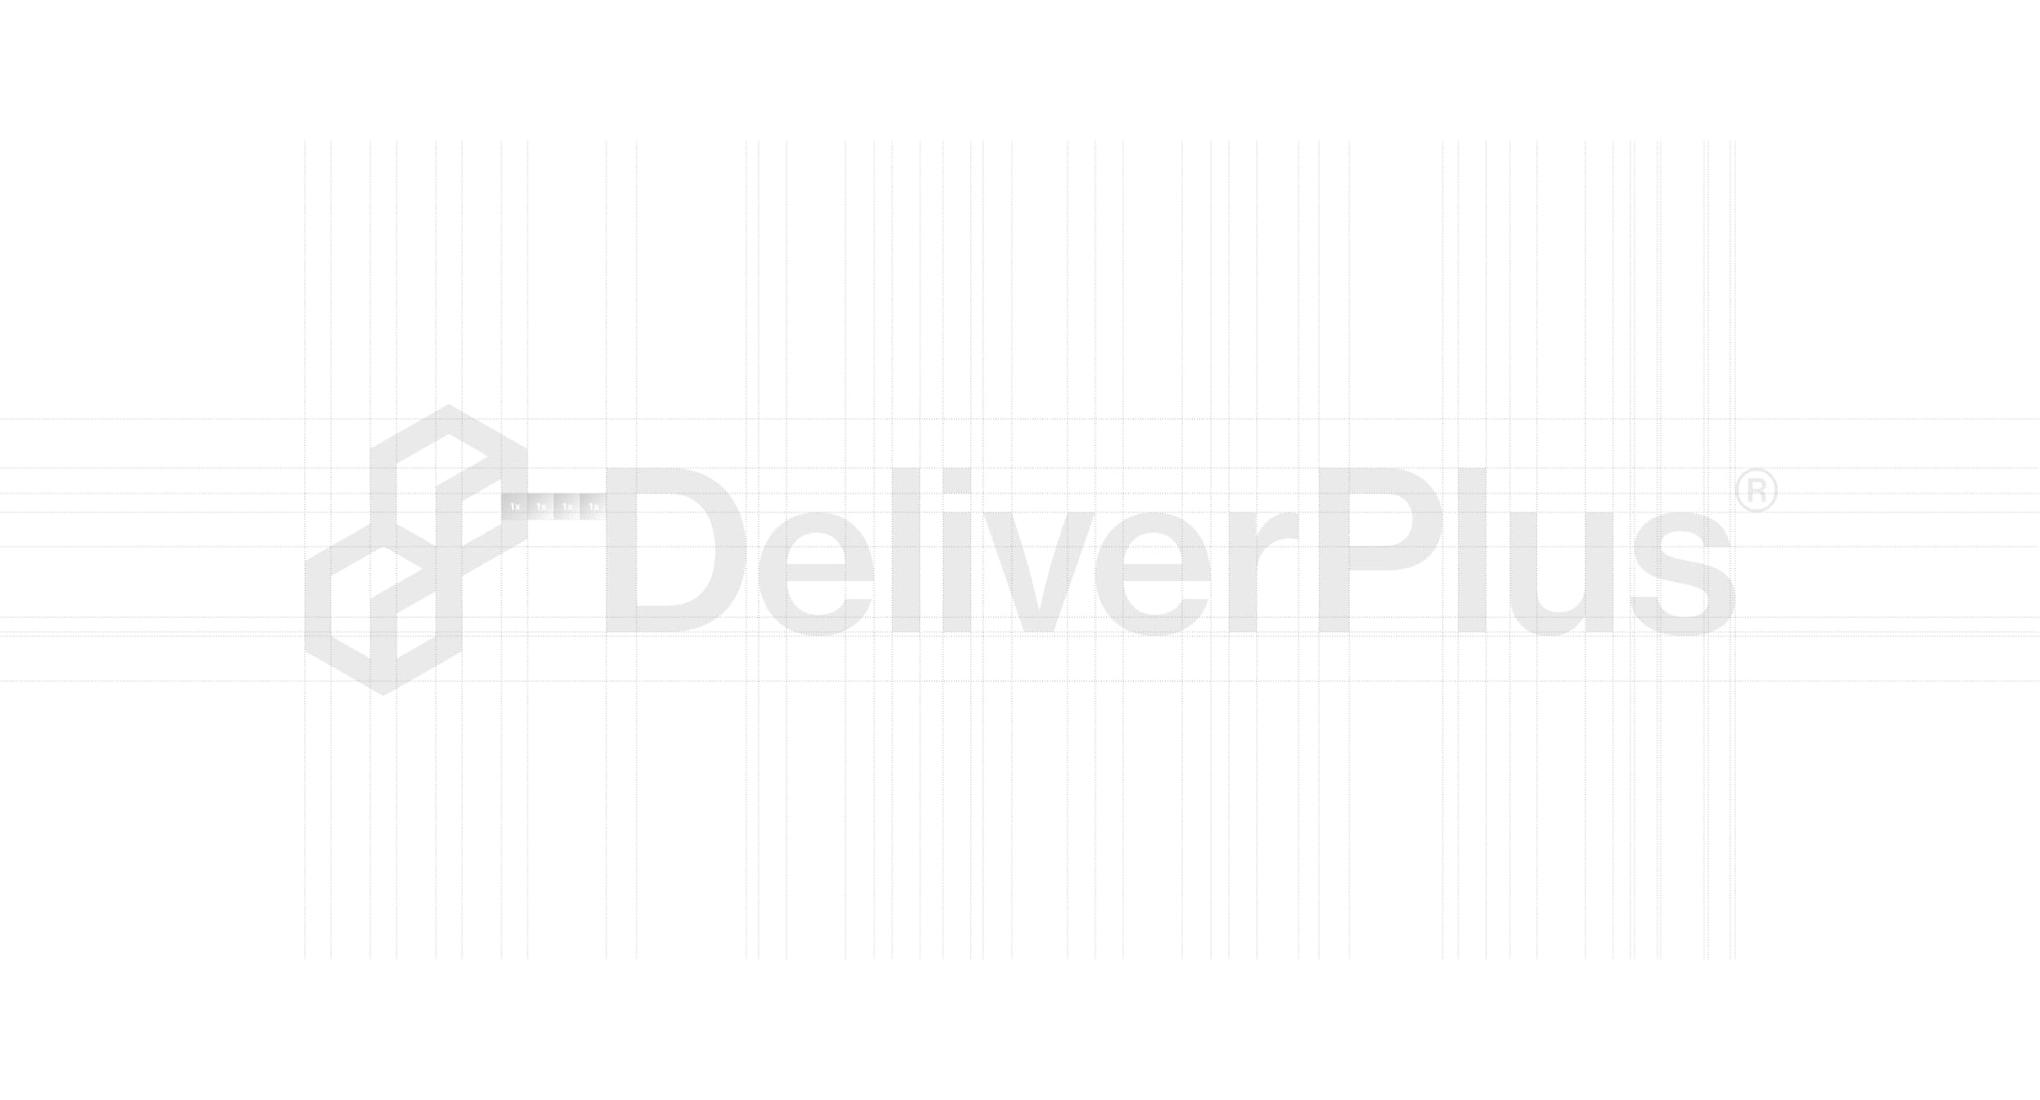 DeliverPlus_02